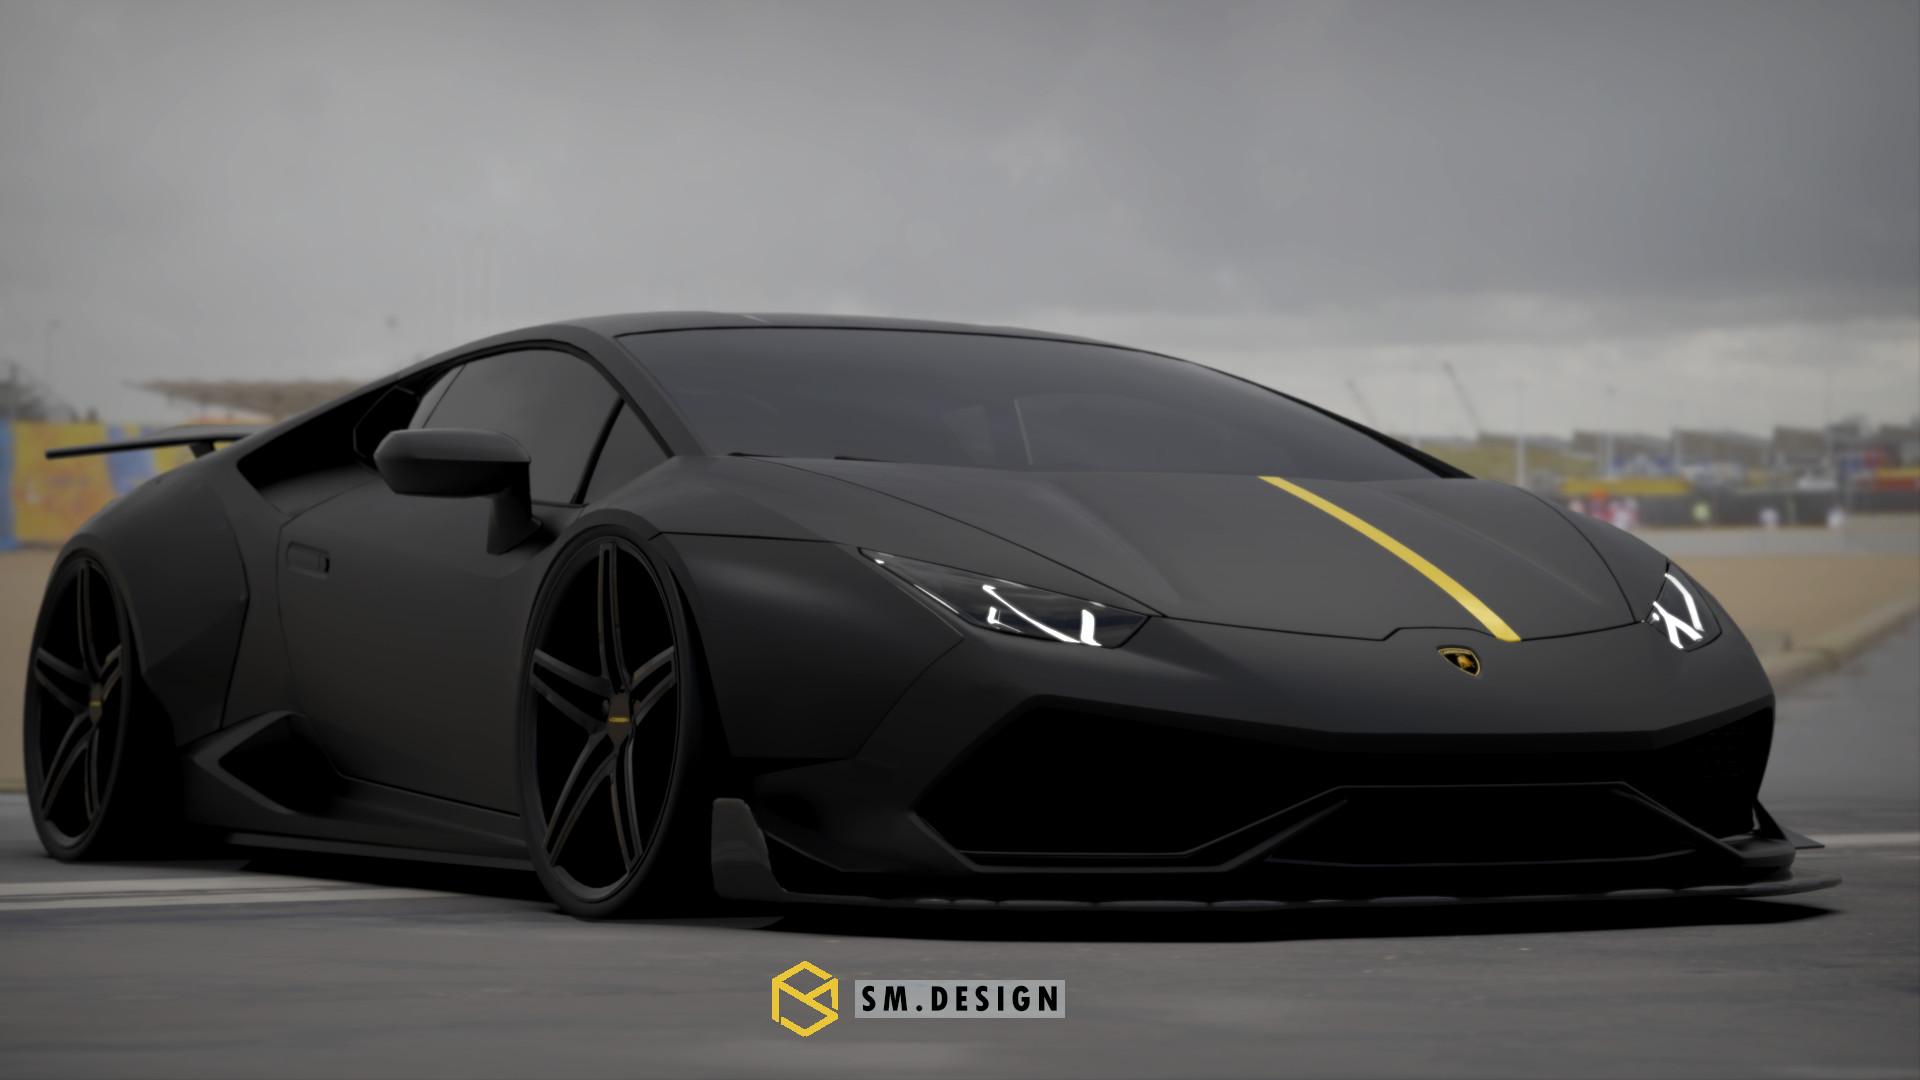 Sm Design Liberty Walk Lamborghini Huracan On Vossen Wheels